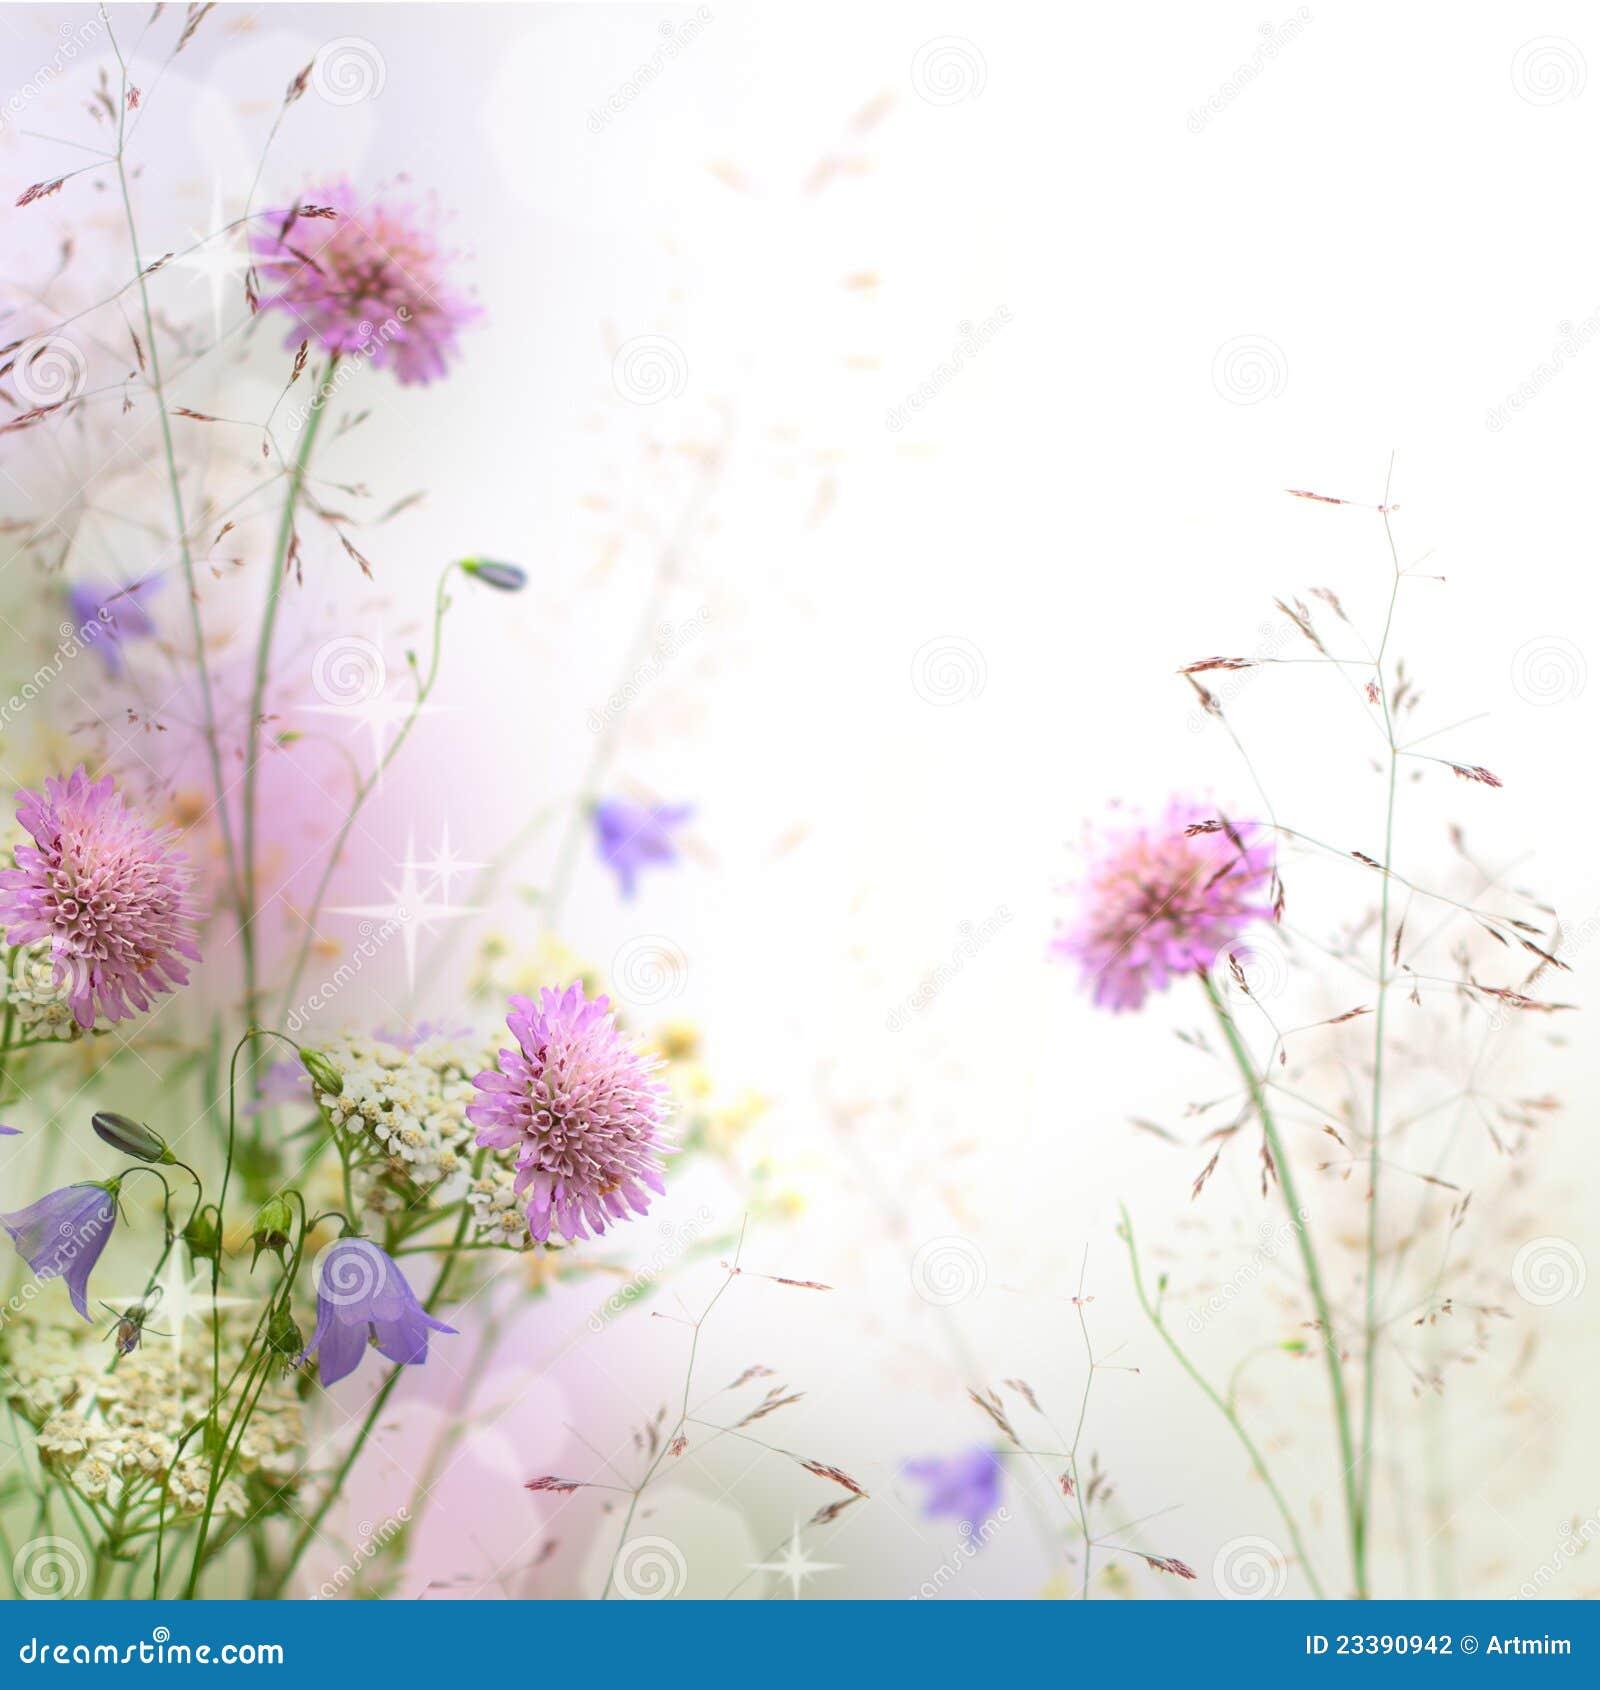 beau cadre floral en pastel photo stock image du brouill l ment 23390942. Black Bedroom Furniture Sets. Home Design Ideas